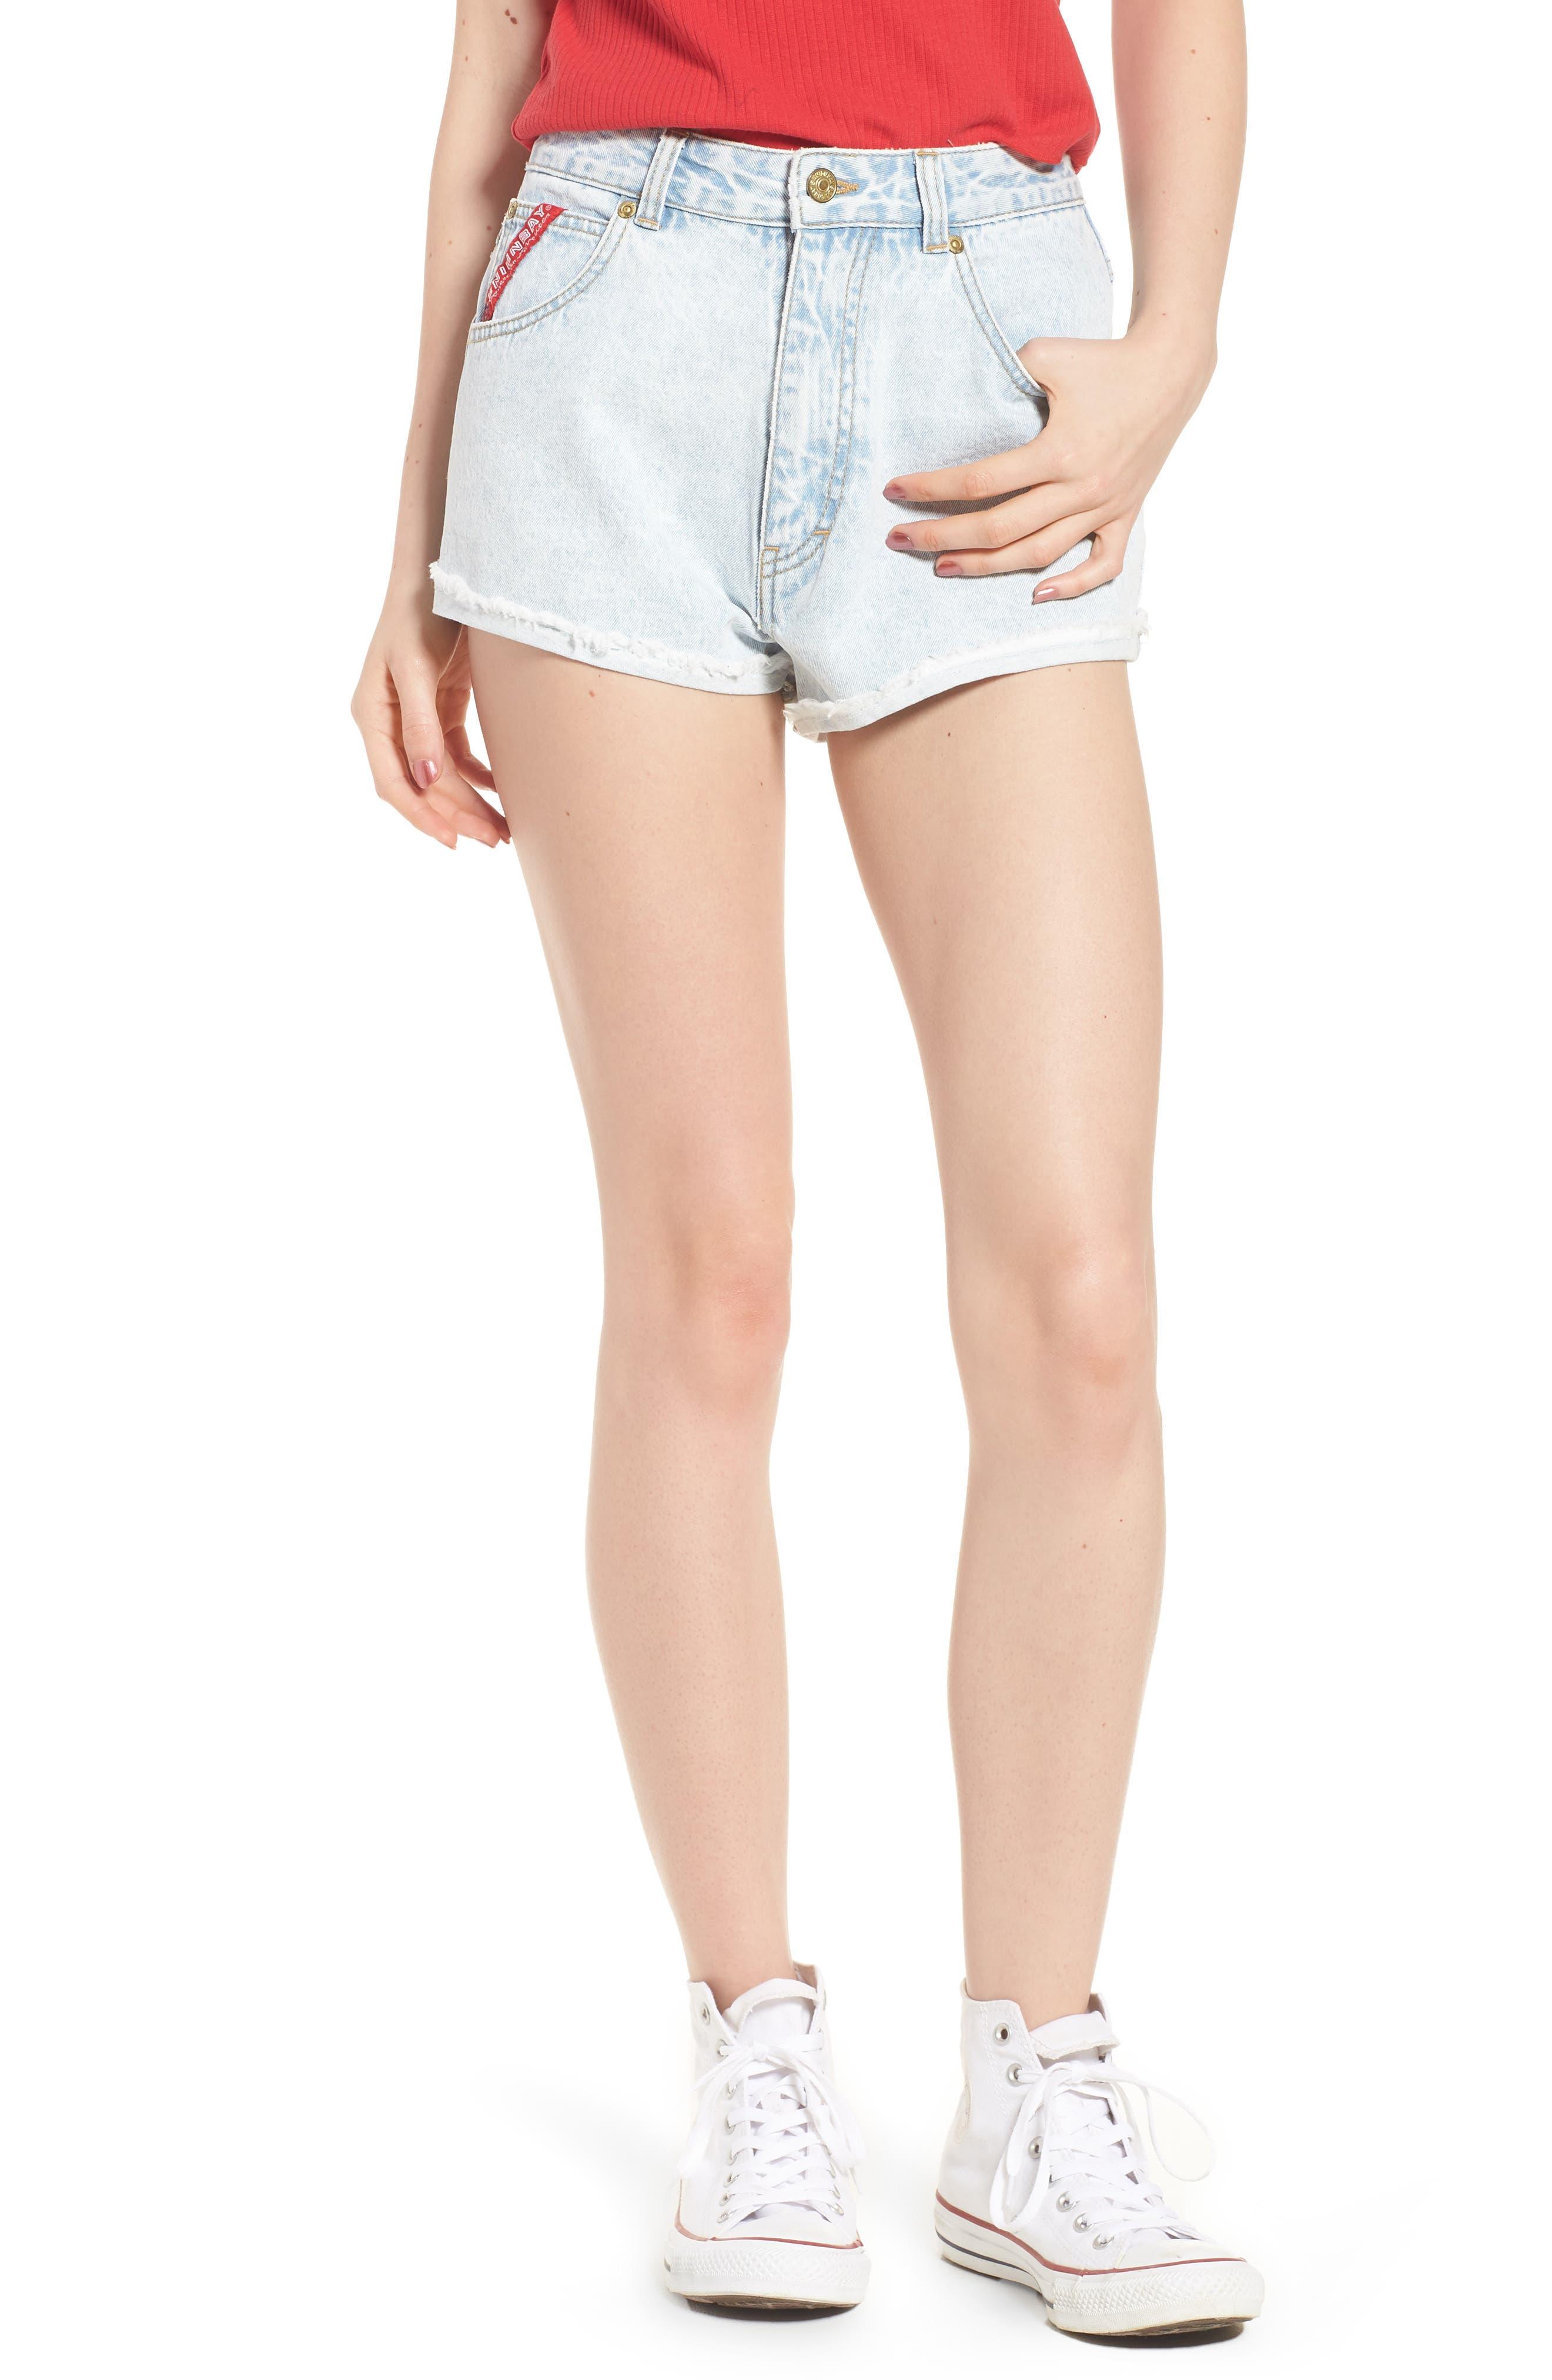 Unionbay Devo Acid Wash Denim Shorts,                             Main thumbnail 1, color,                             Icy Wash